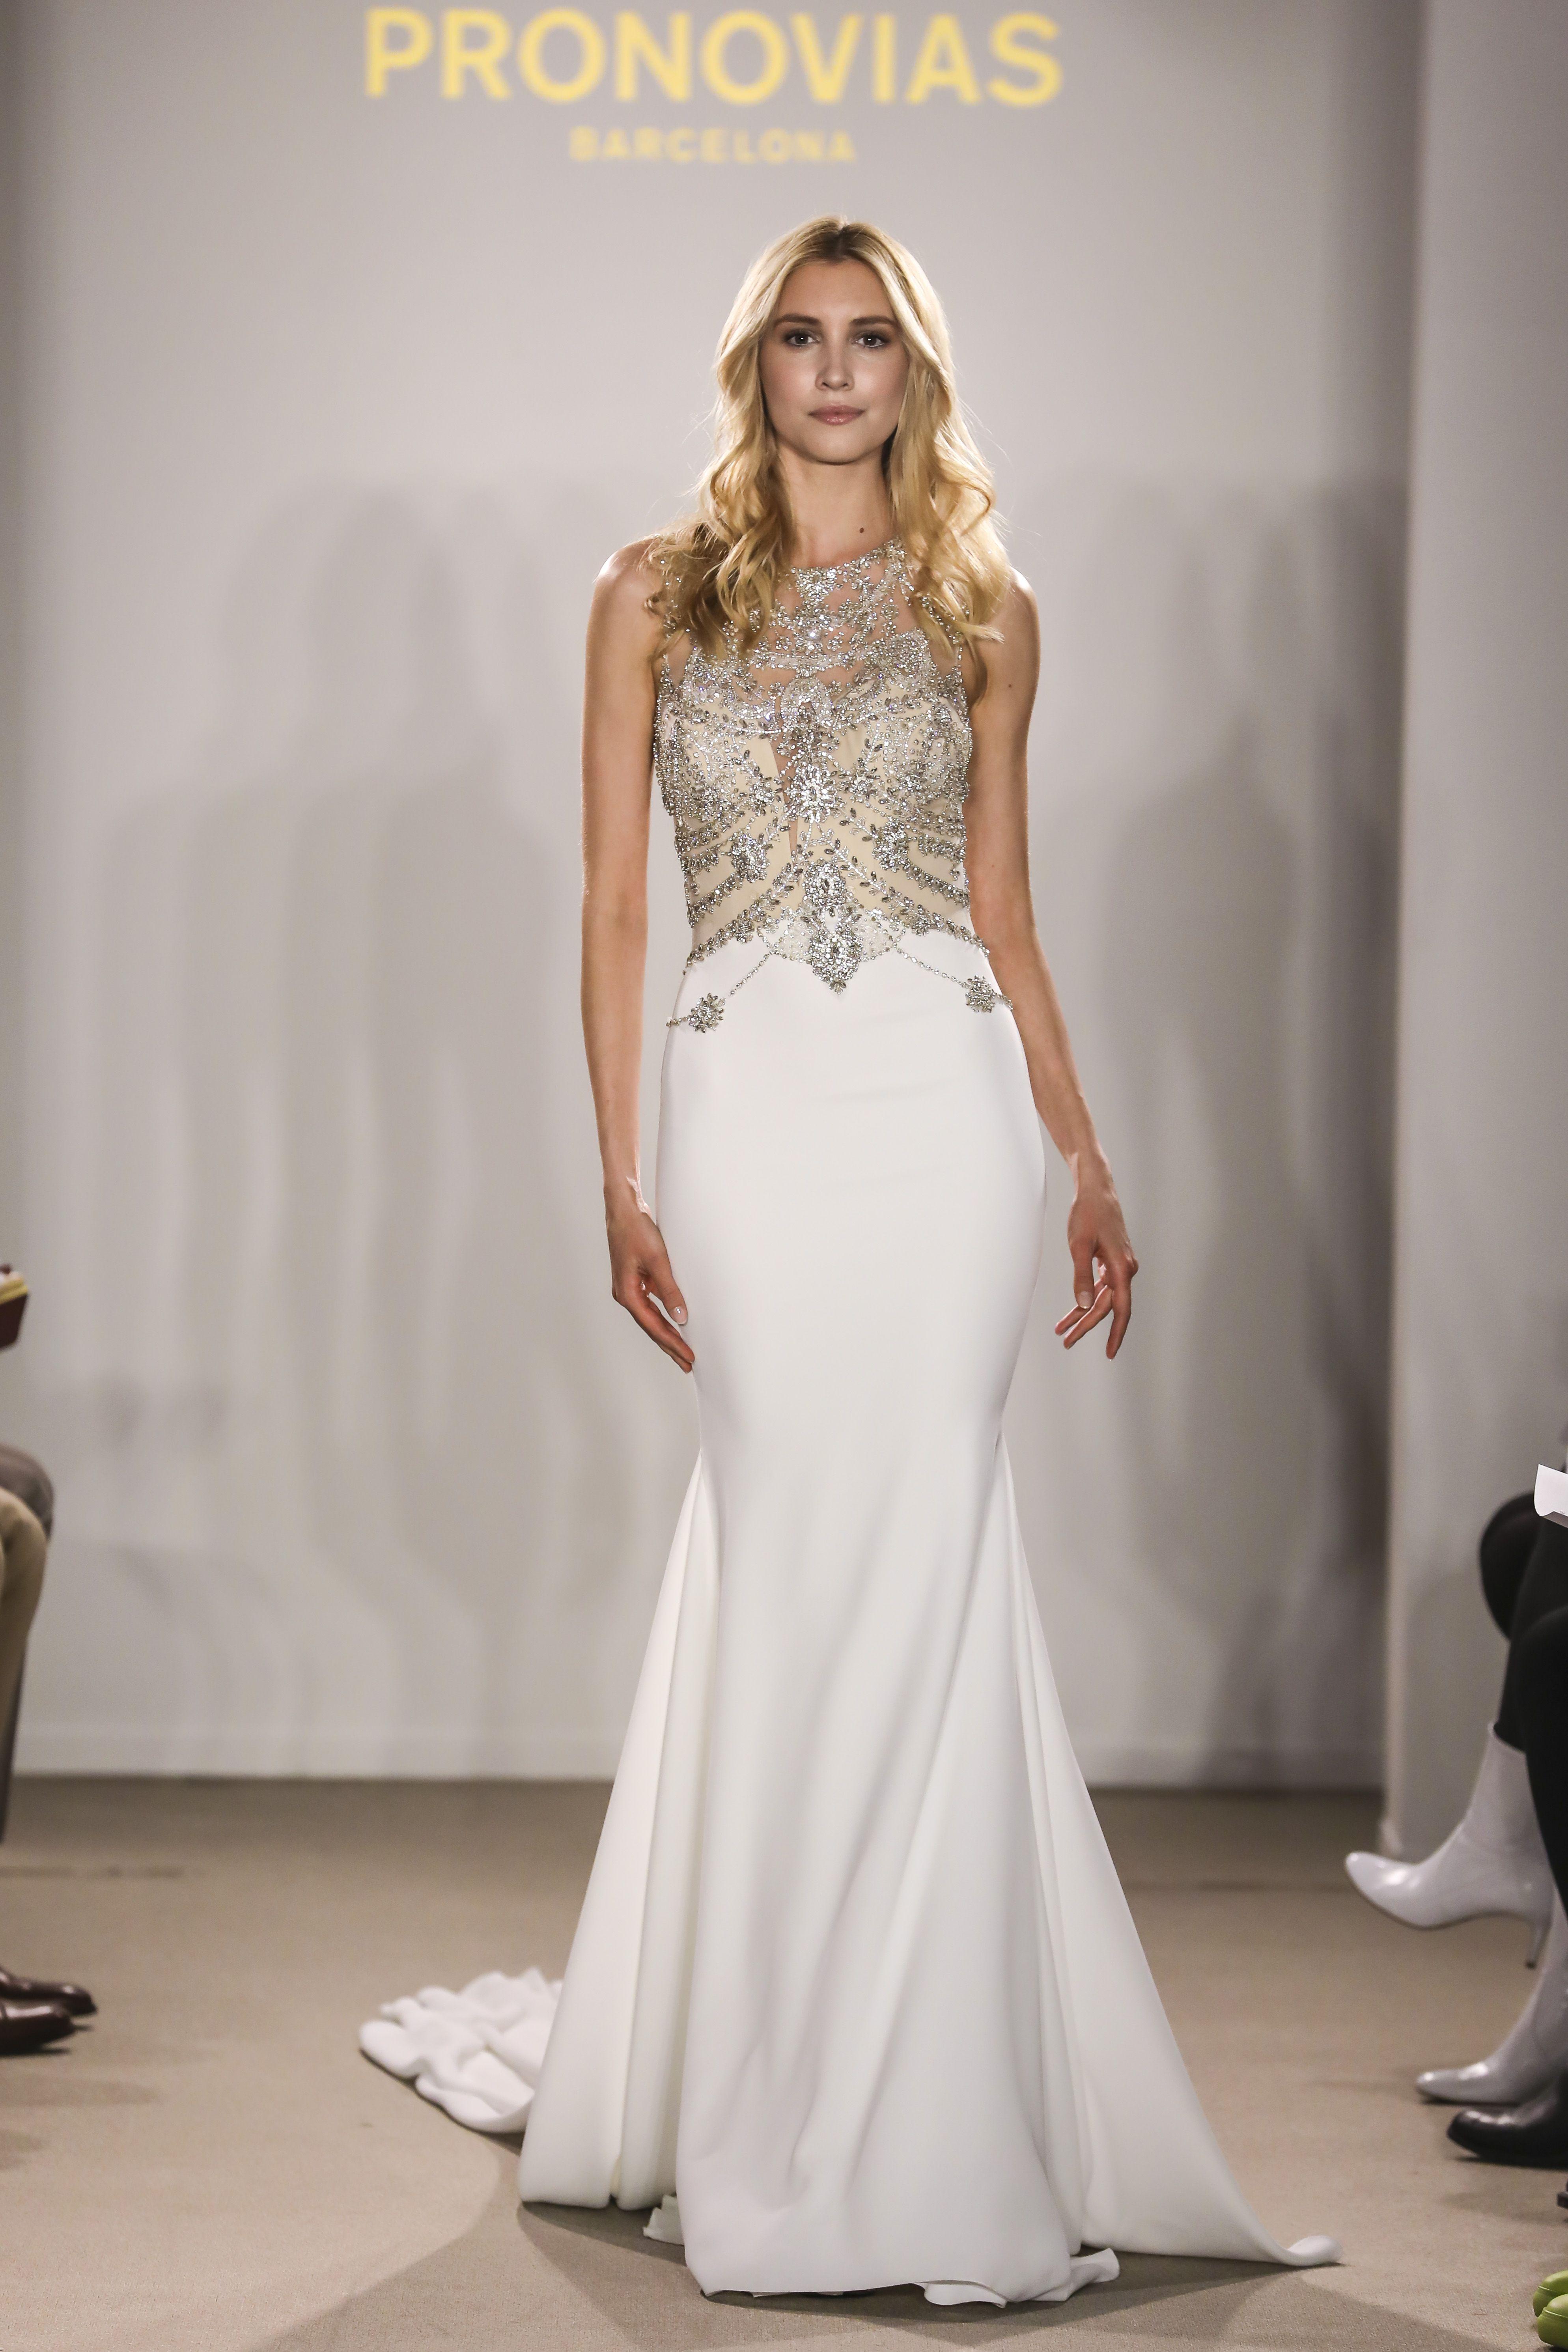 atelier pronovias preview collection weddings pinterest